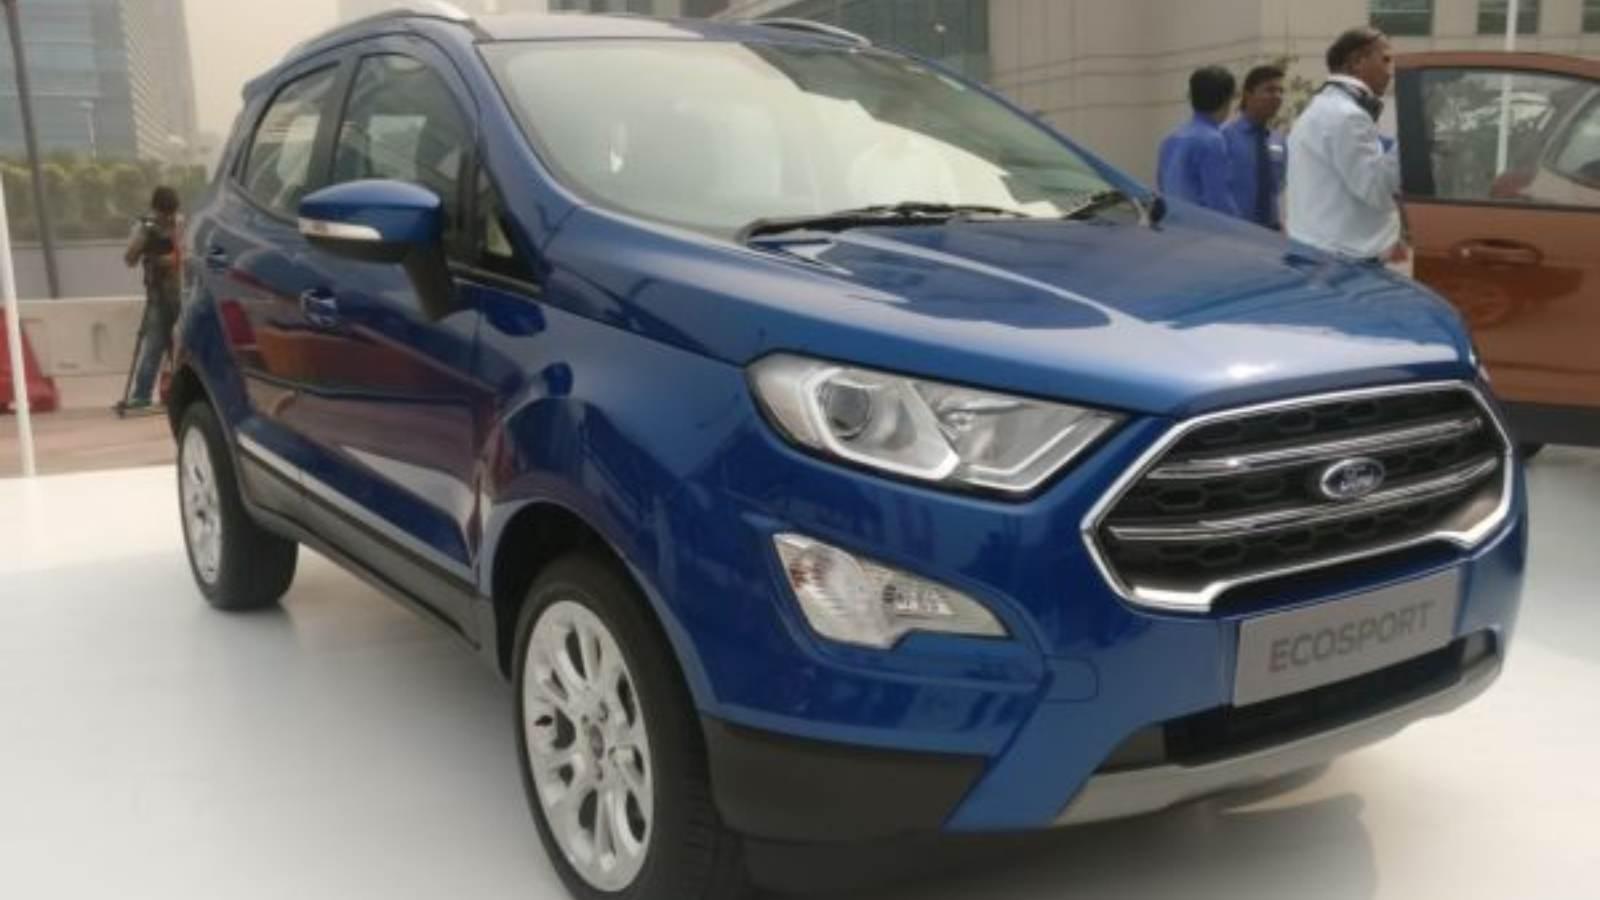 My 2019 Ford Ecosport Price List Revealed Range Now Starts